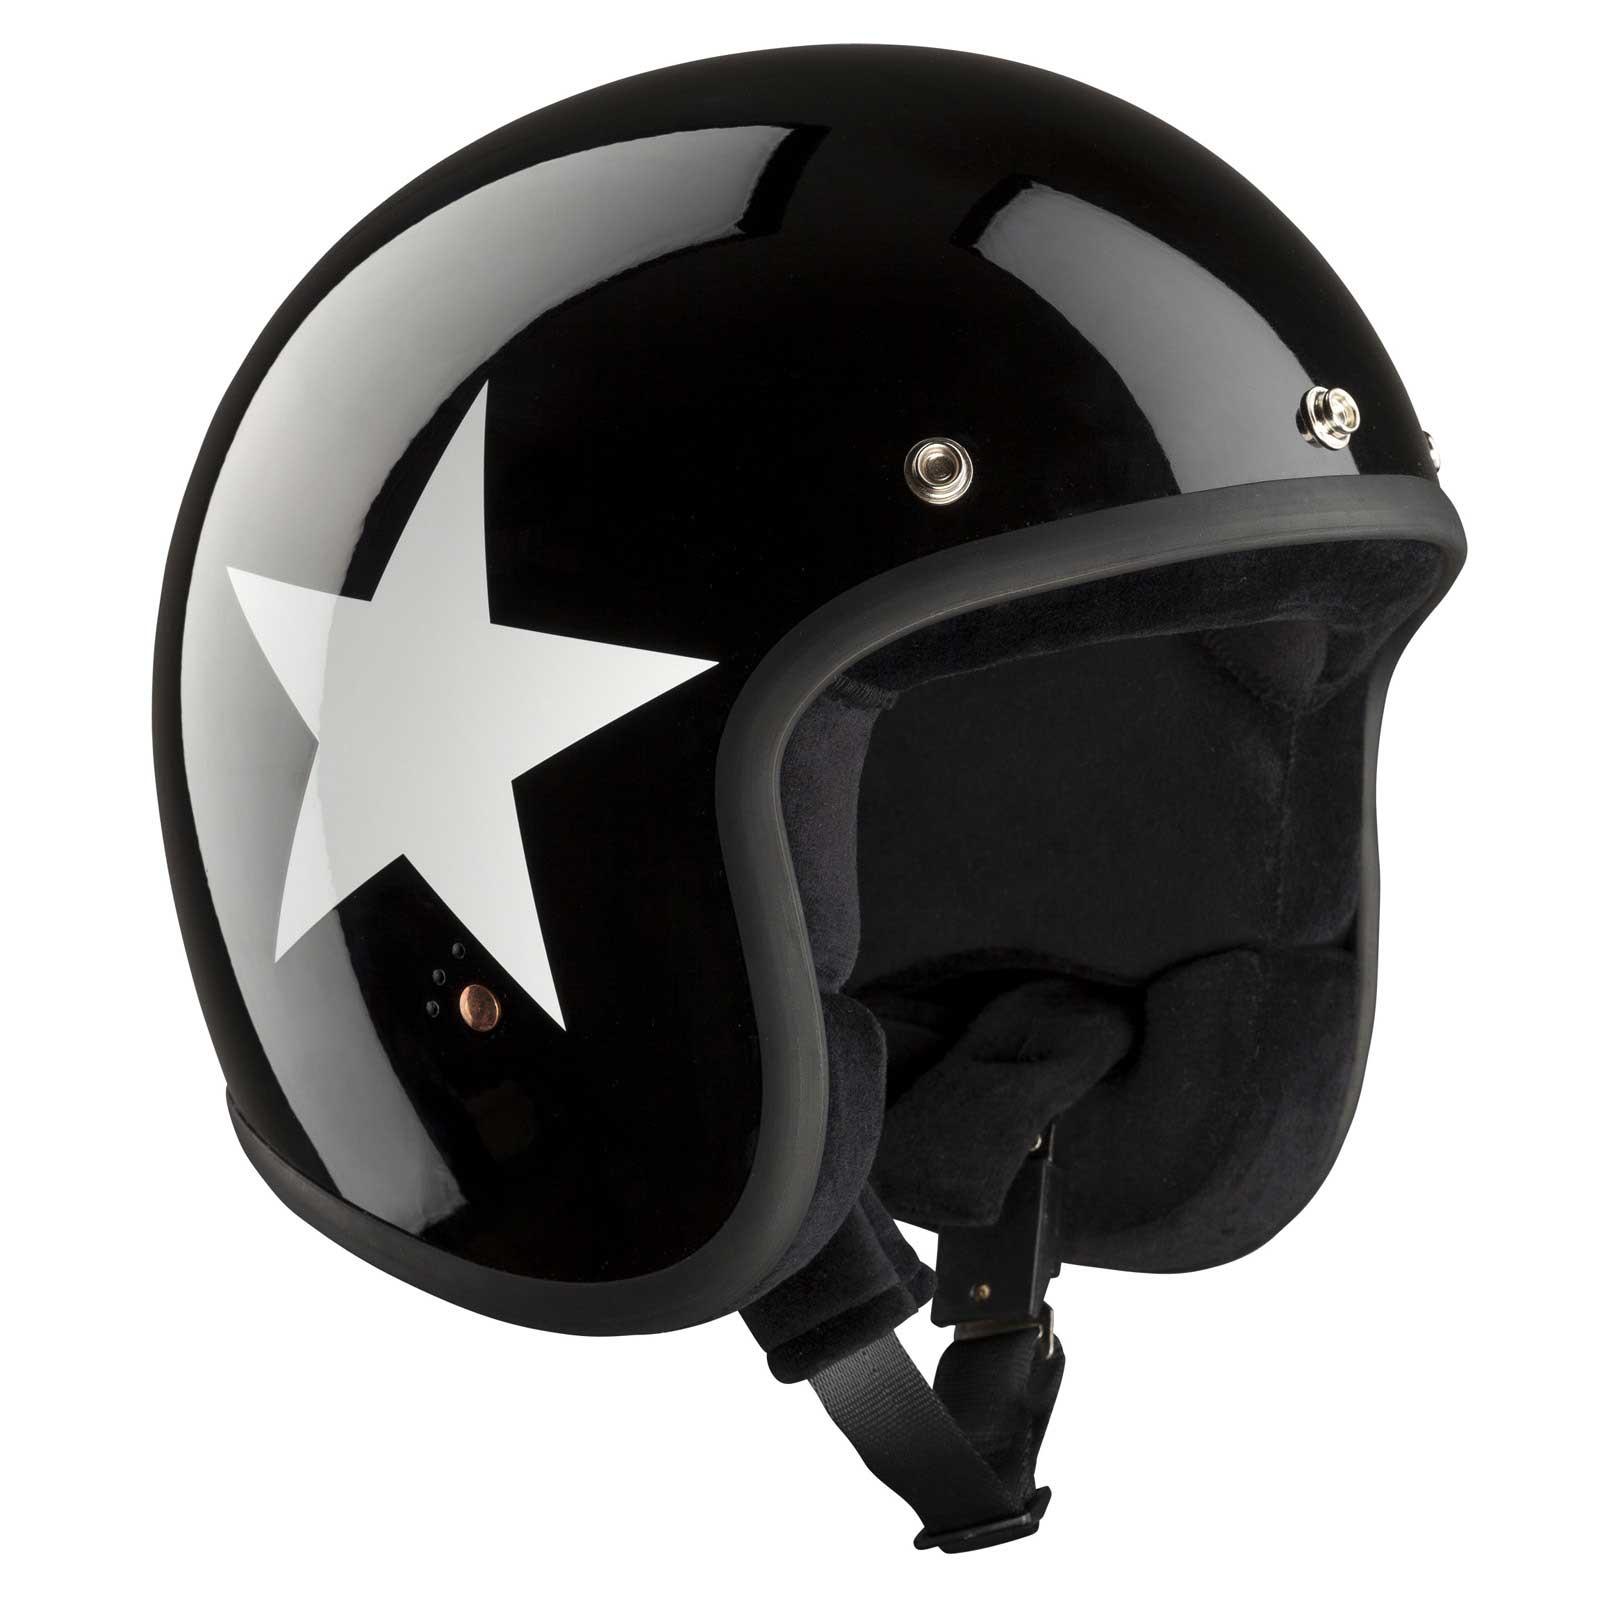 bandit mini ece jet helmet ece 22 05 certified. Black Bedroom Furniture Sets. Home Design Ideas